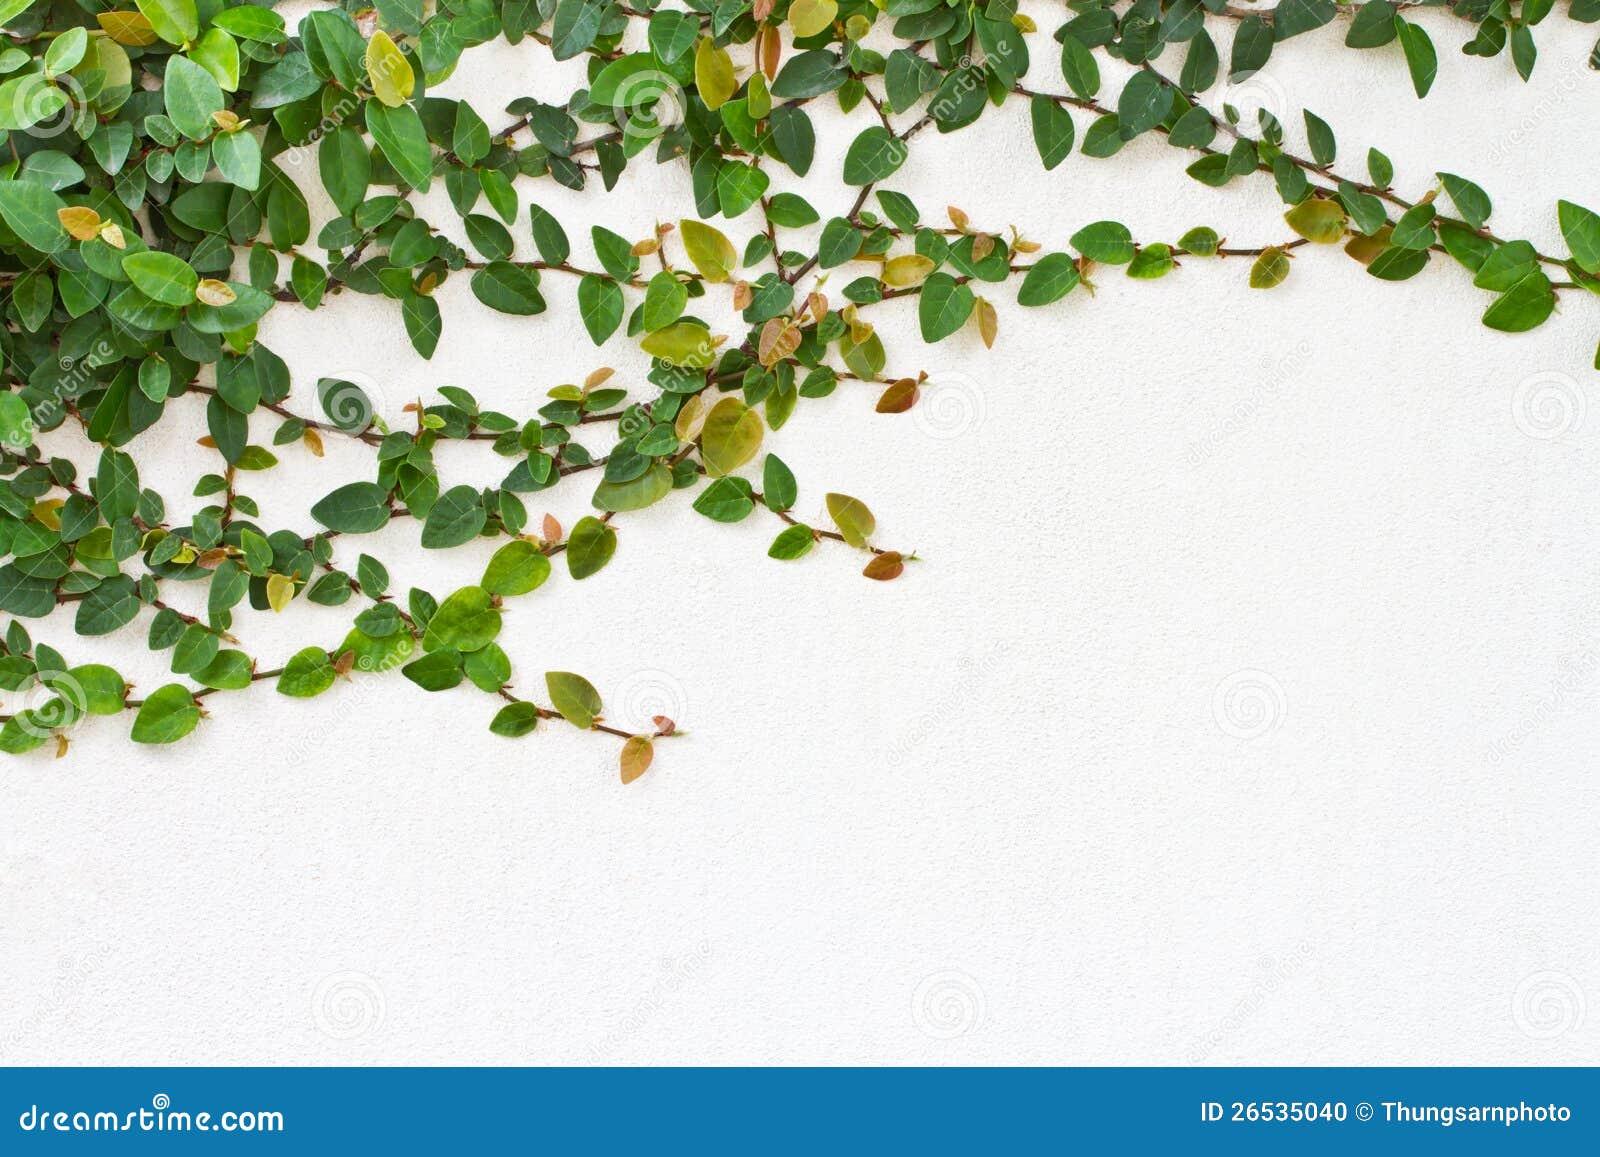 centrale verte de plante grimpante photo stock image. Black Bedroom Furniture Sets. Home Design Ideas